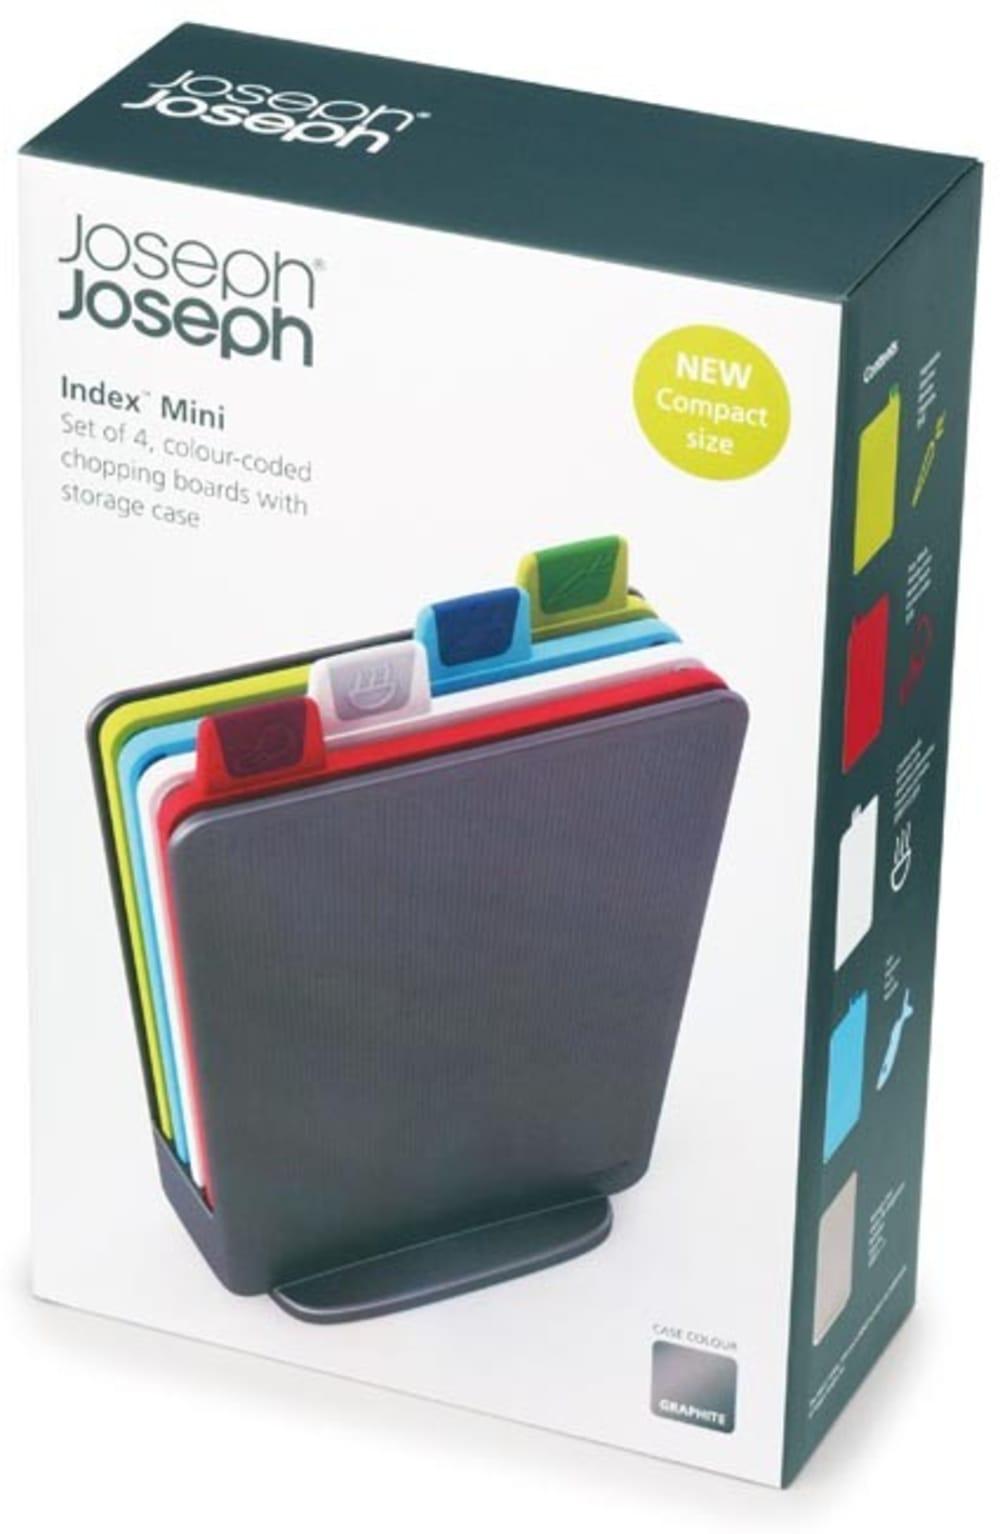 Zestaw 4 mini desek do krojenia JOSEPH JOSEPH Index